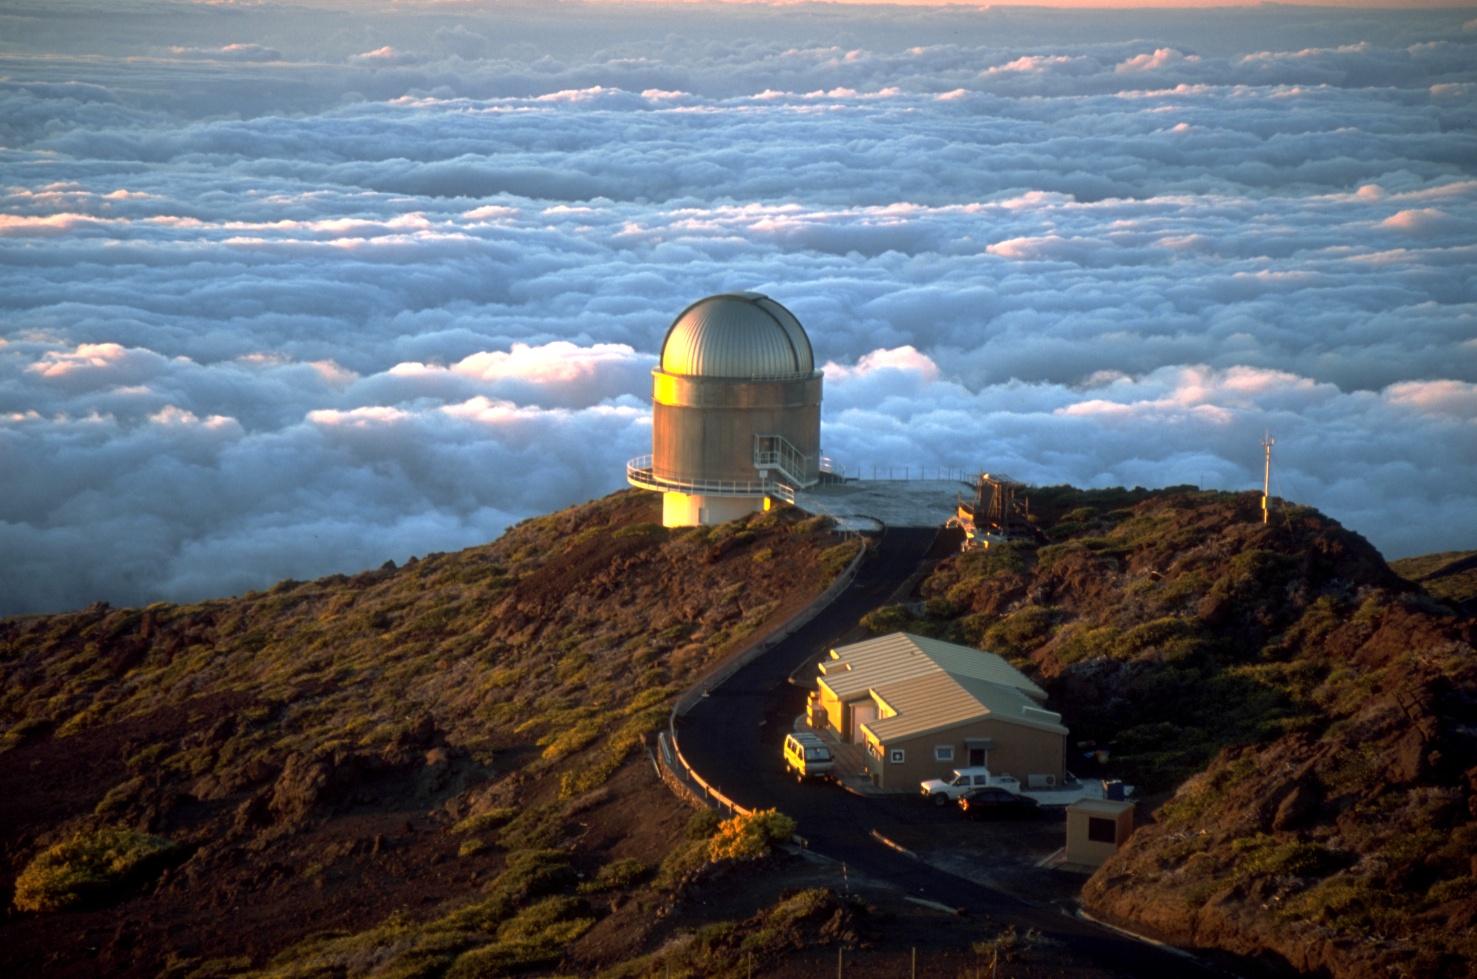 The Remote Telescope System.